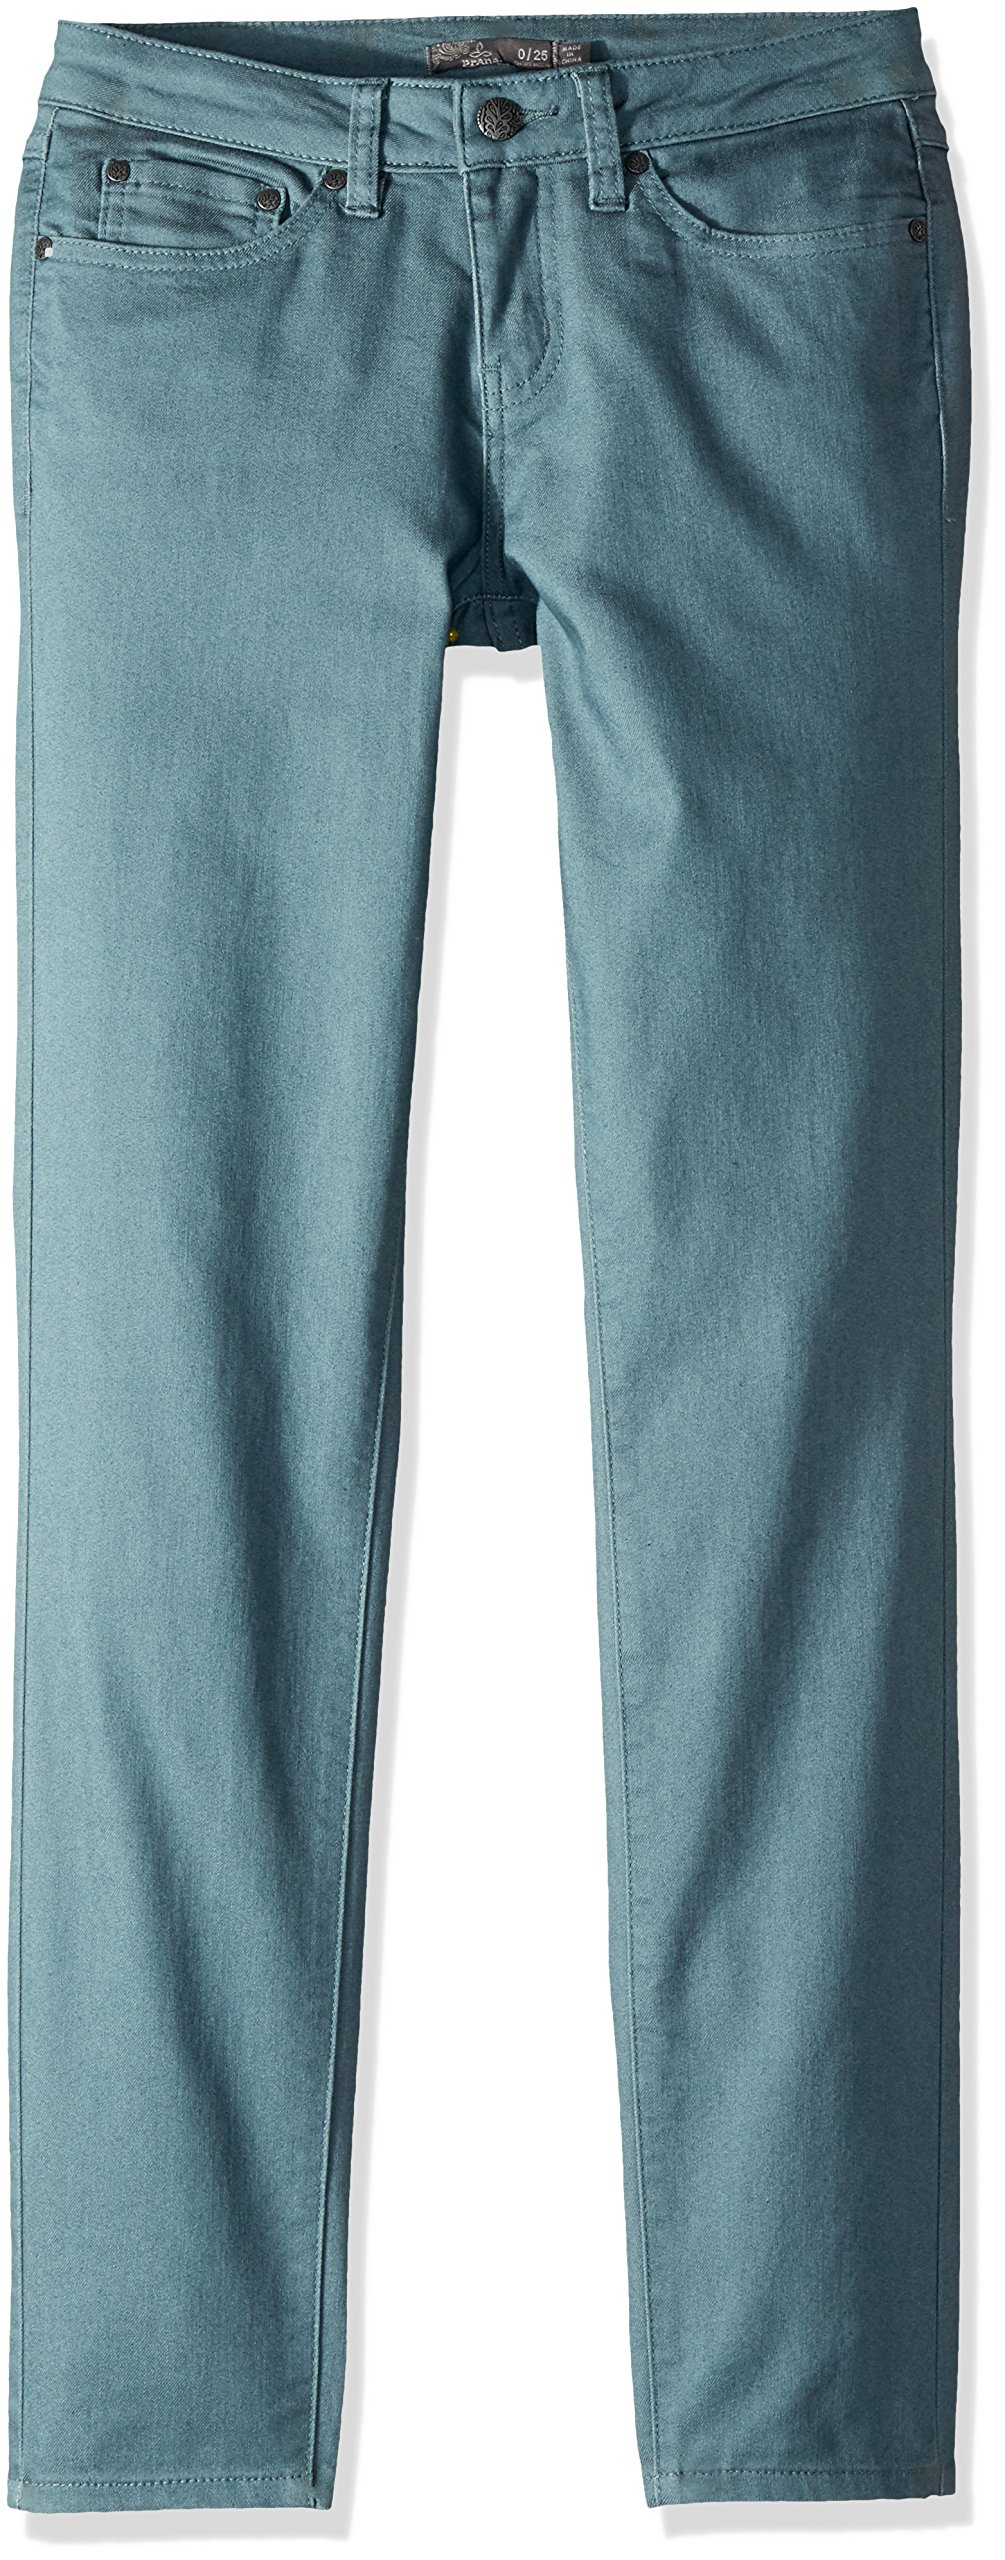 prAna Kayla Jean Inseam Pants, Starling Green, Size 6 by prAna